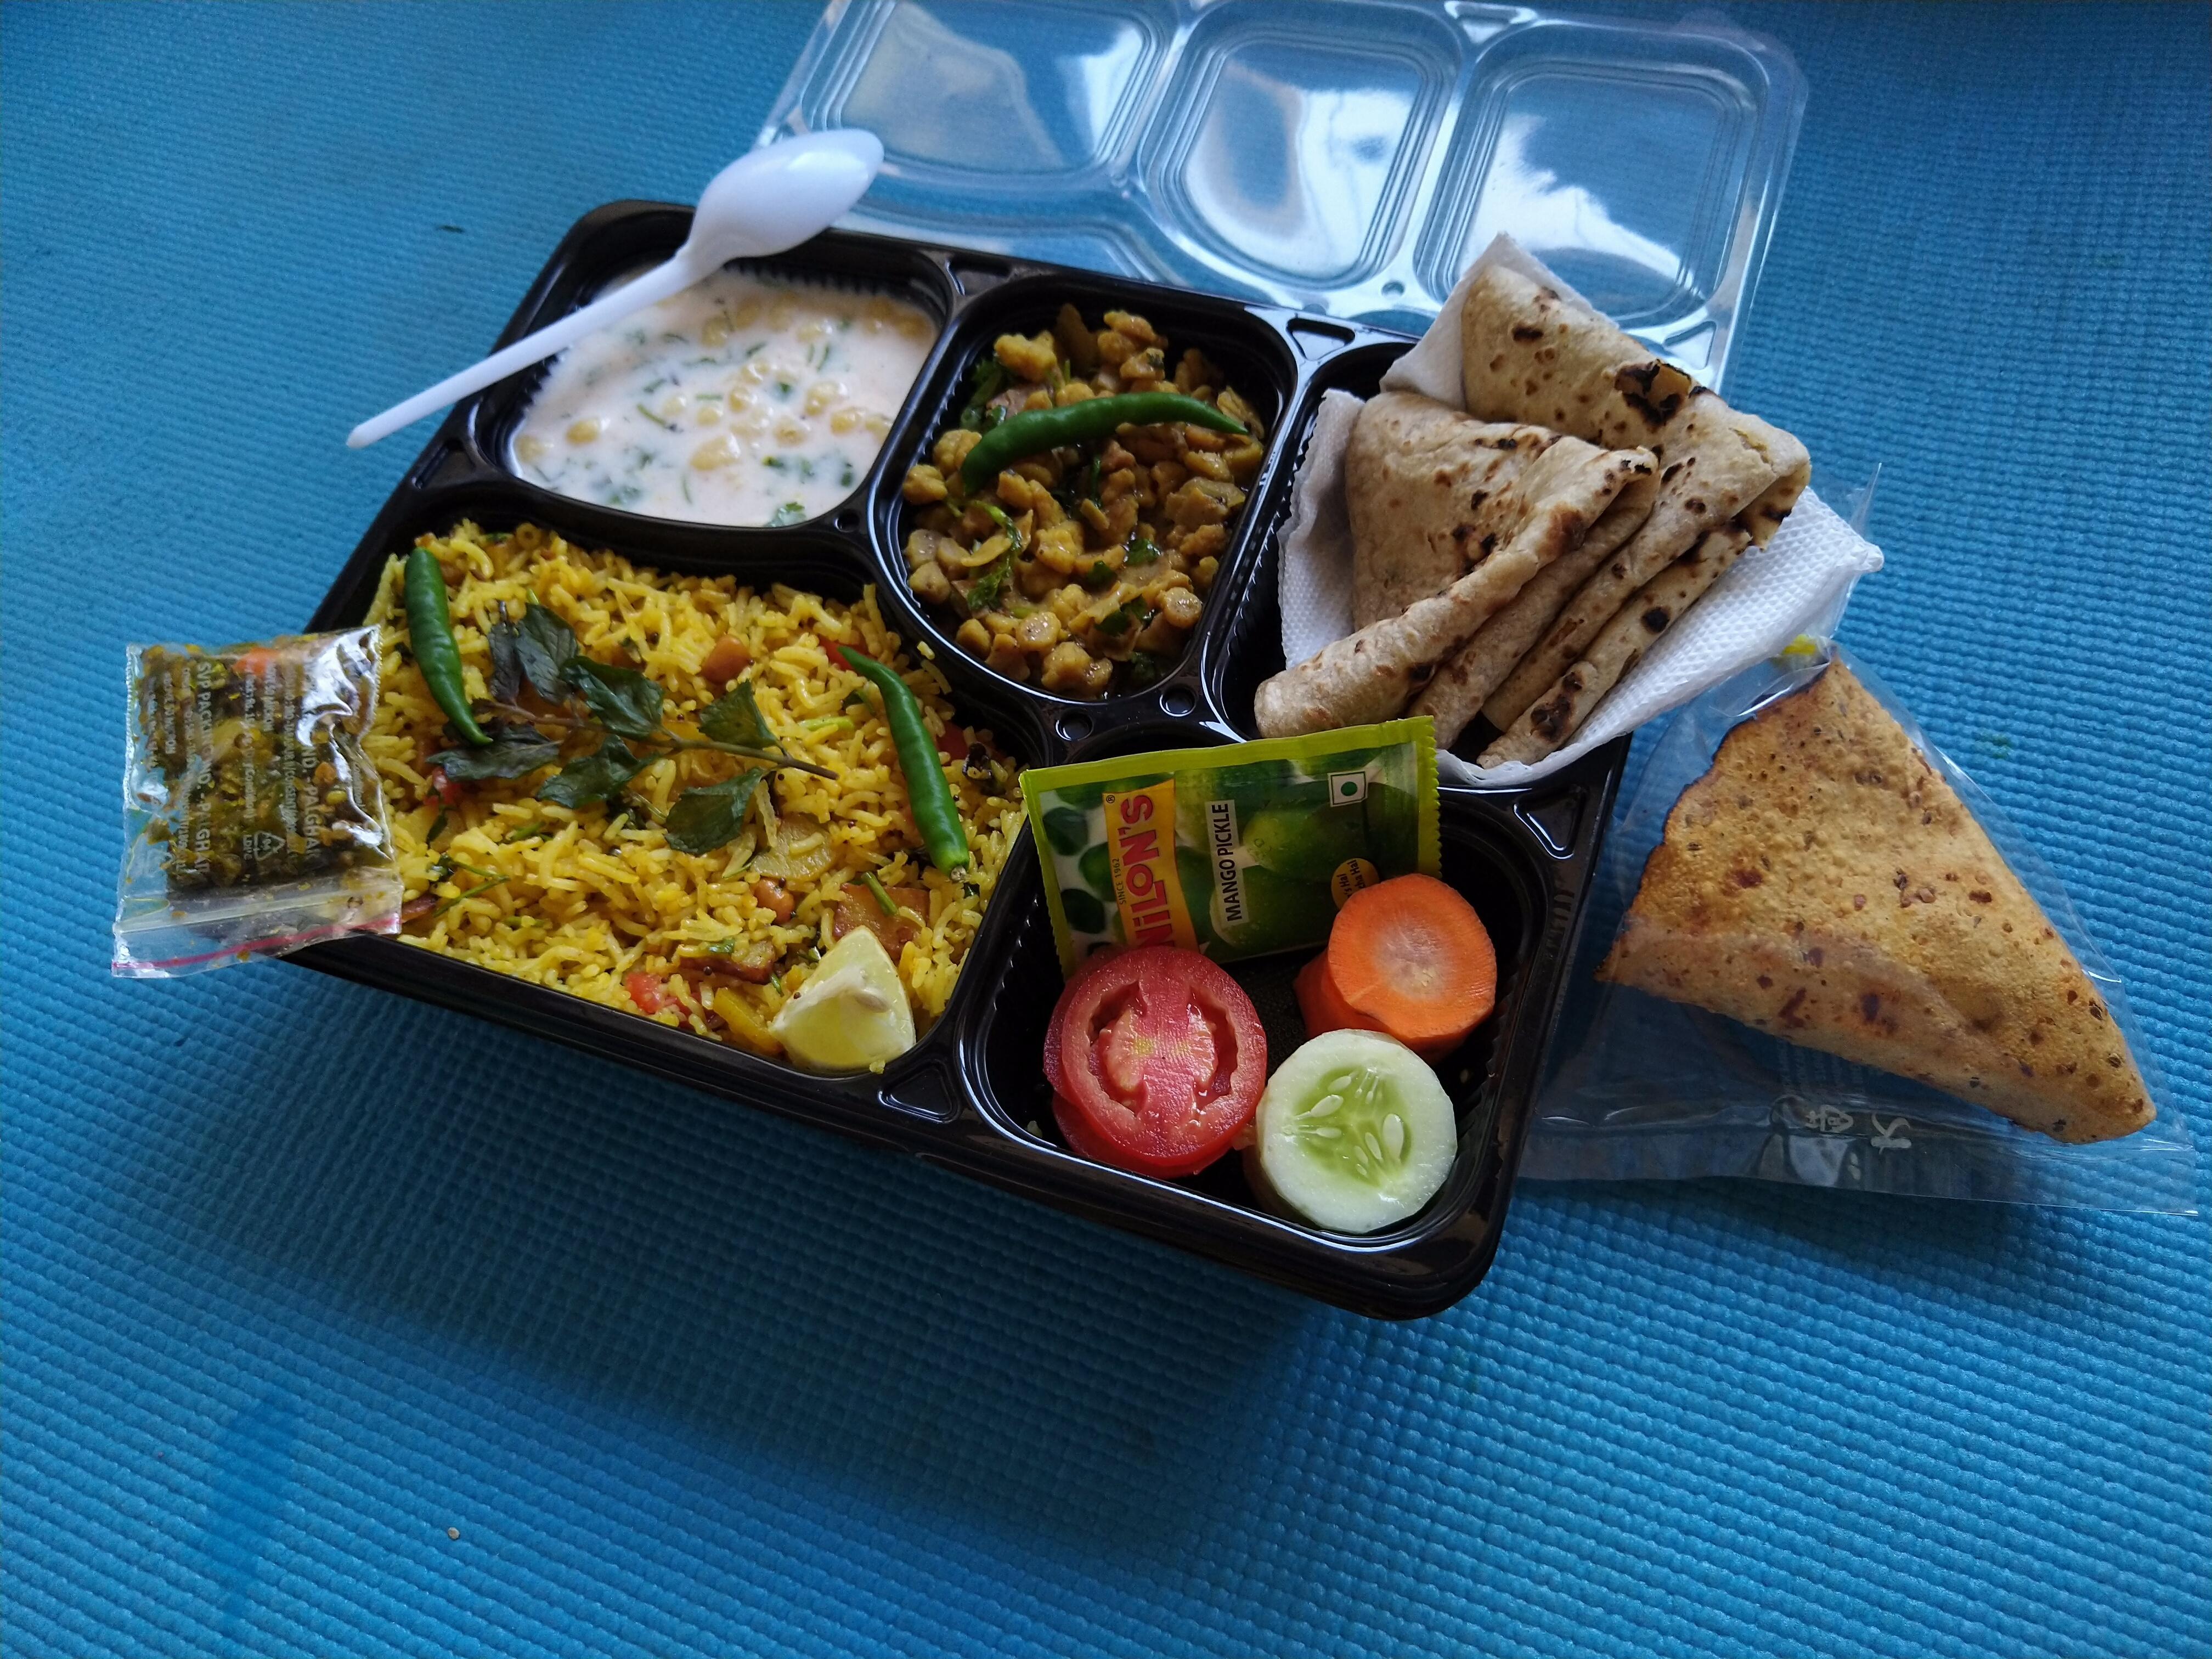 Marwadi Regular Meal